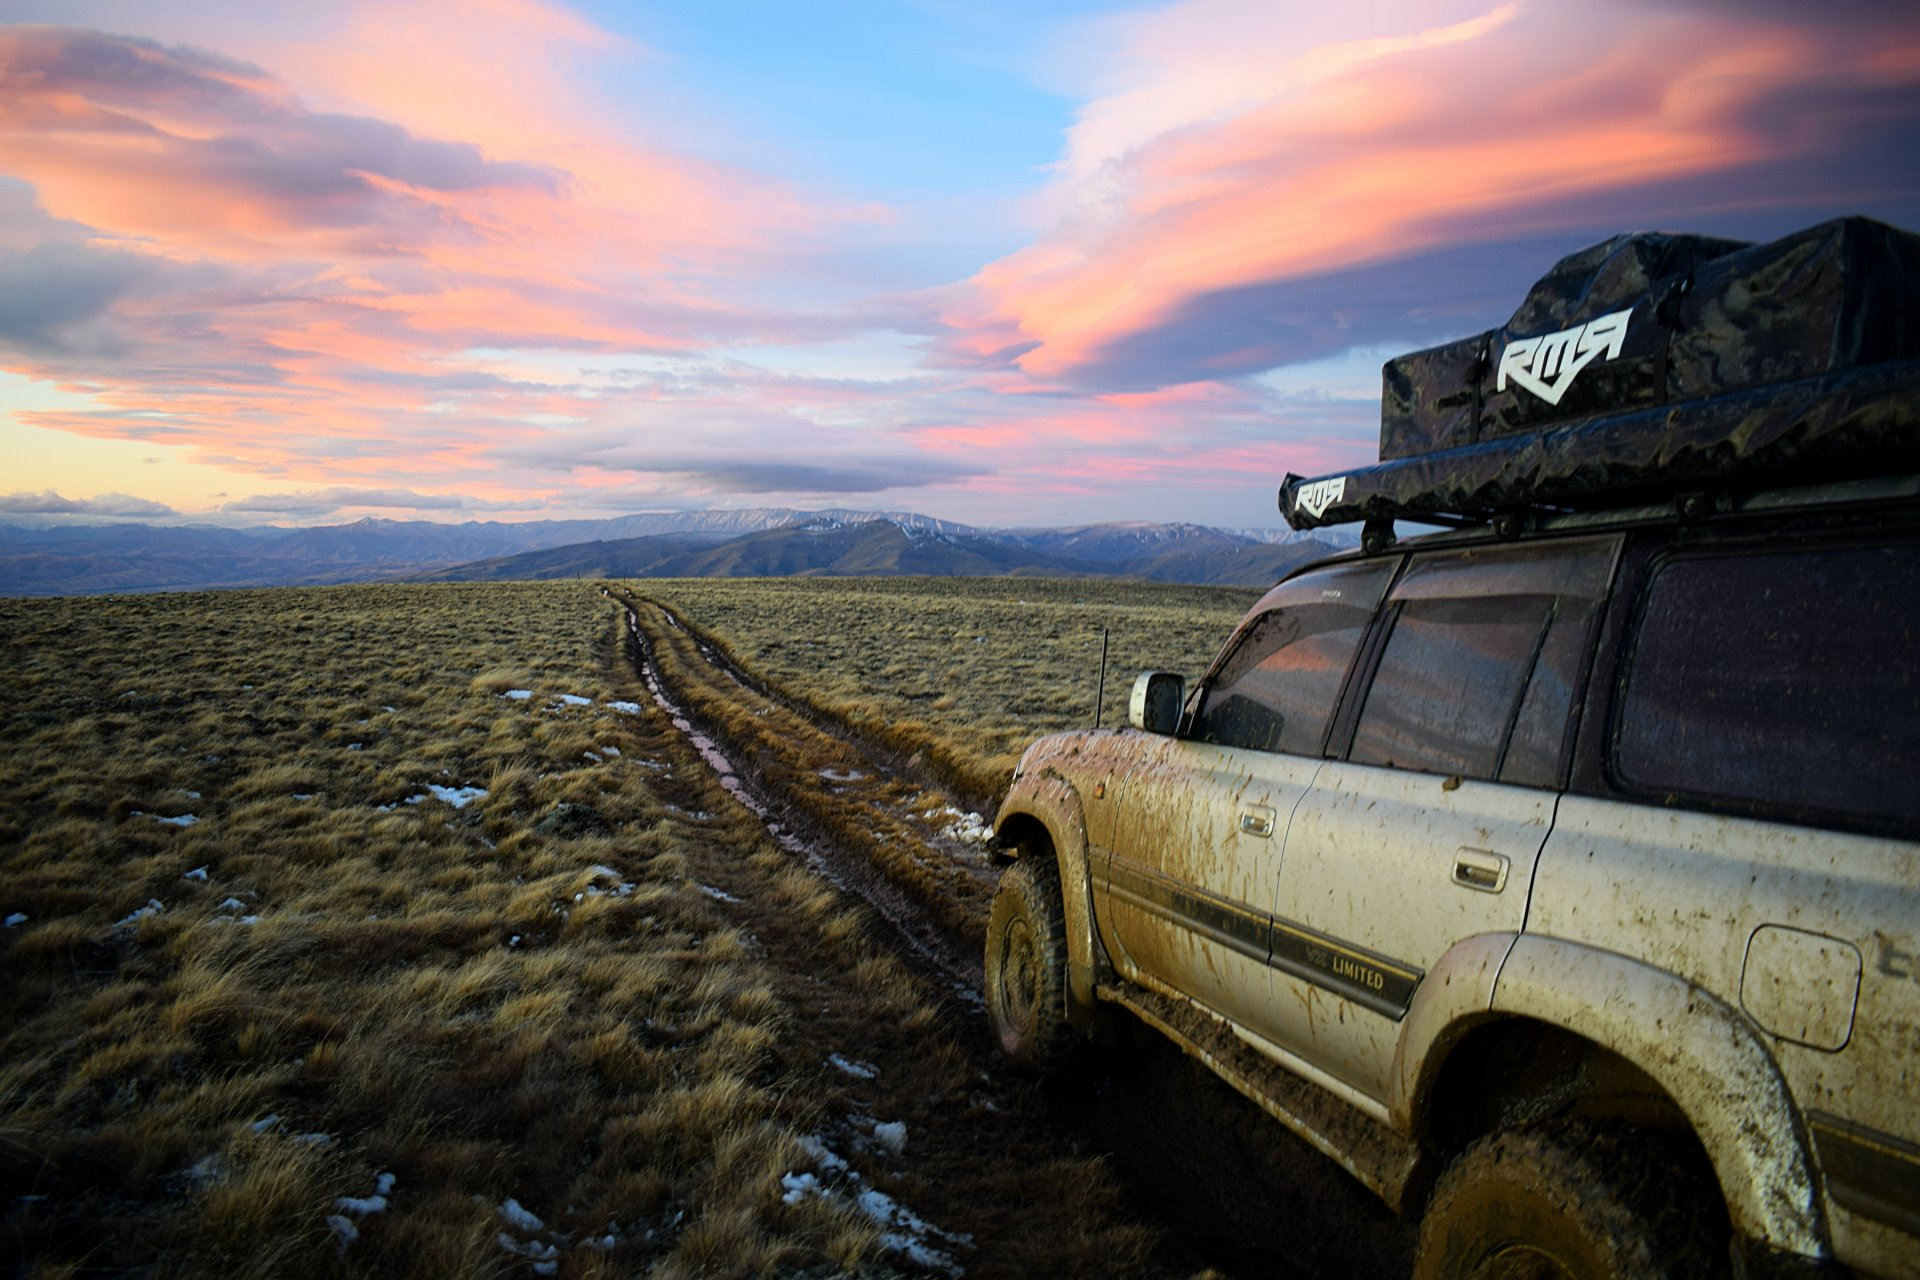 Land Cruiser Sunset Edit.jpg